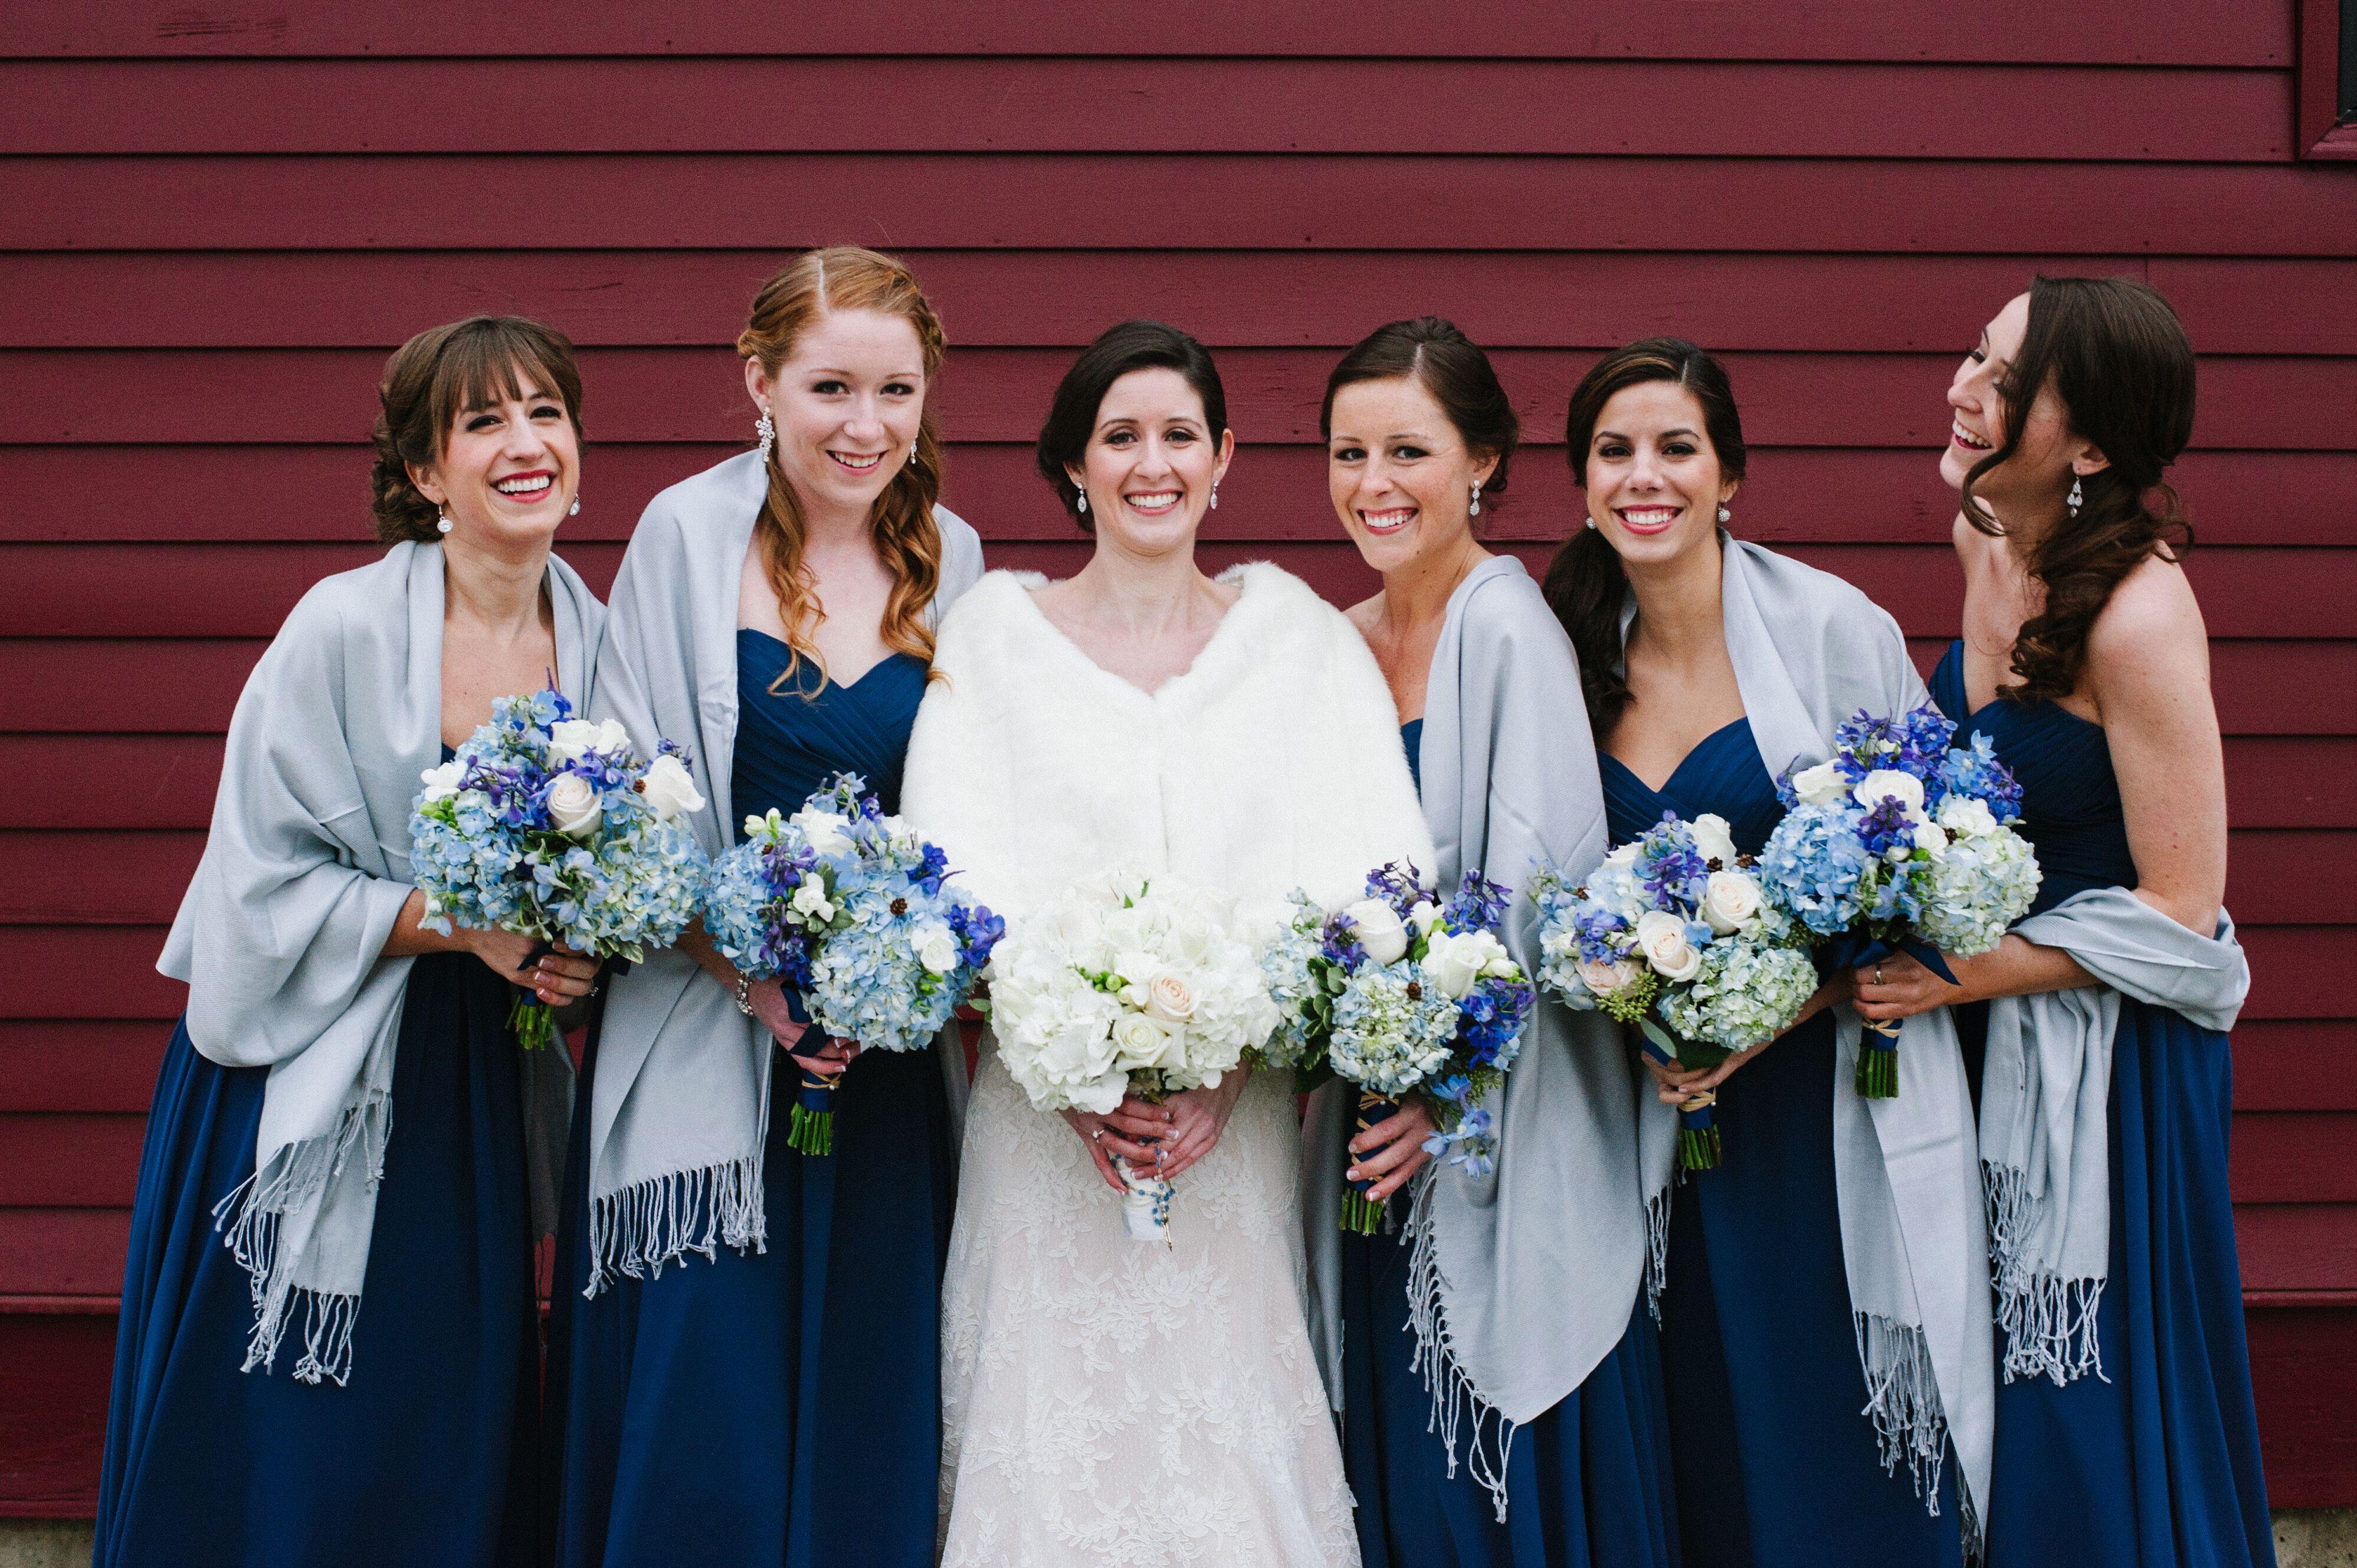 Navy Bridesmaid Dresses With Icy Blue Pashminas